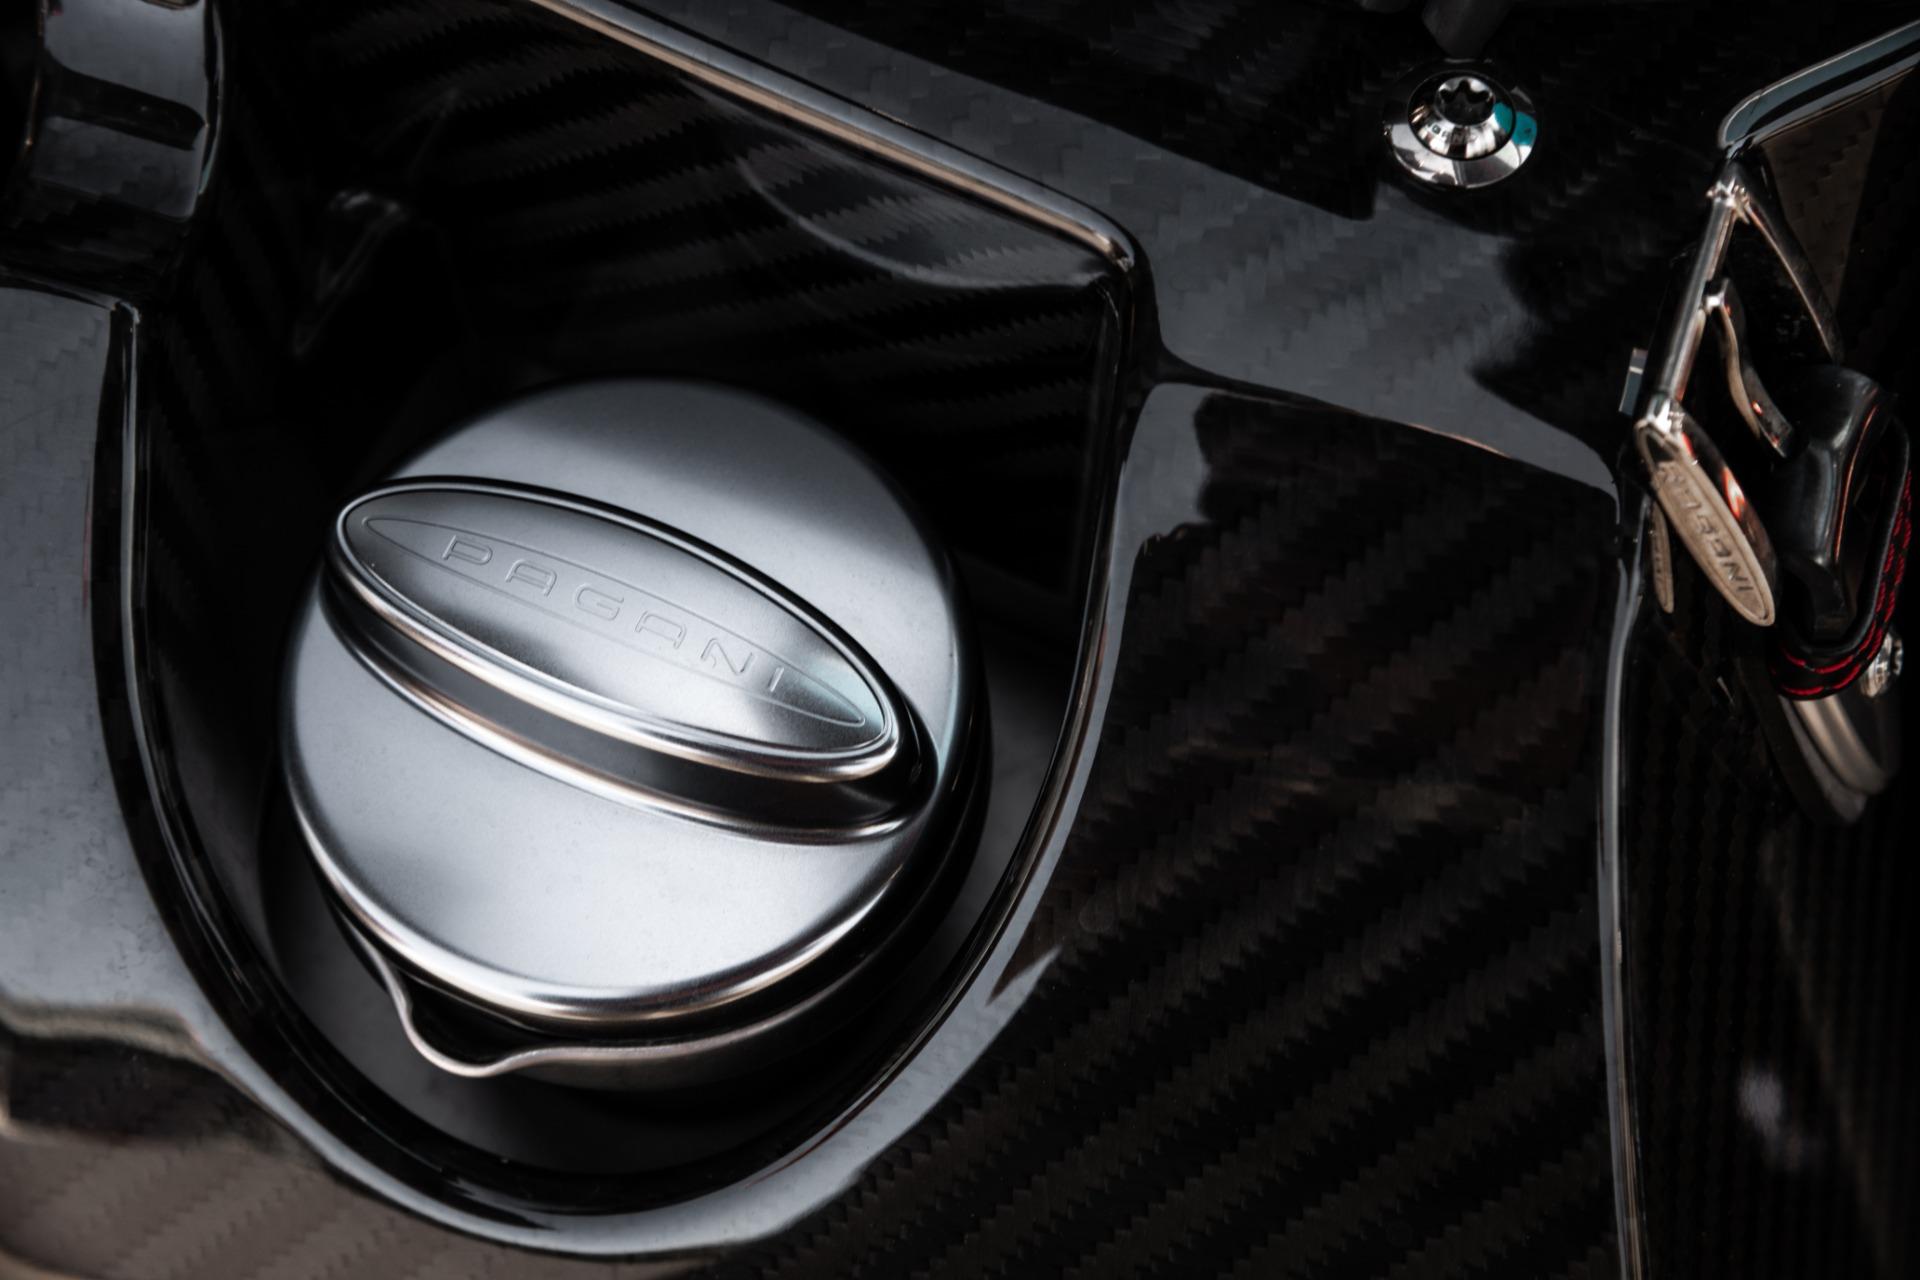 Used 2014 Pagani Huayra Tempesta For Sale In Greenwich, CT. Alfa Romeo of Greenwich, 7321 2841_p19